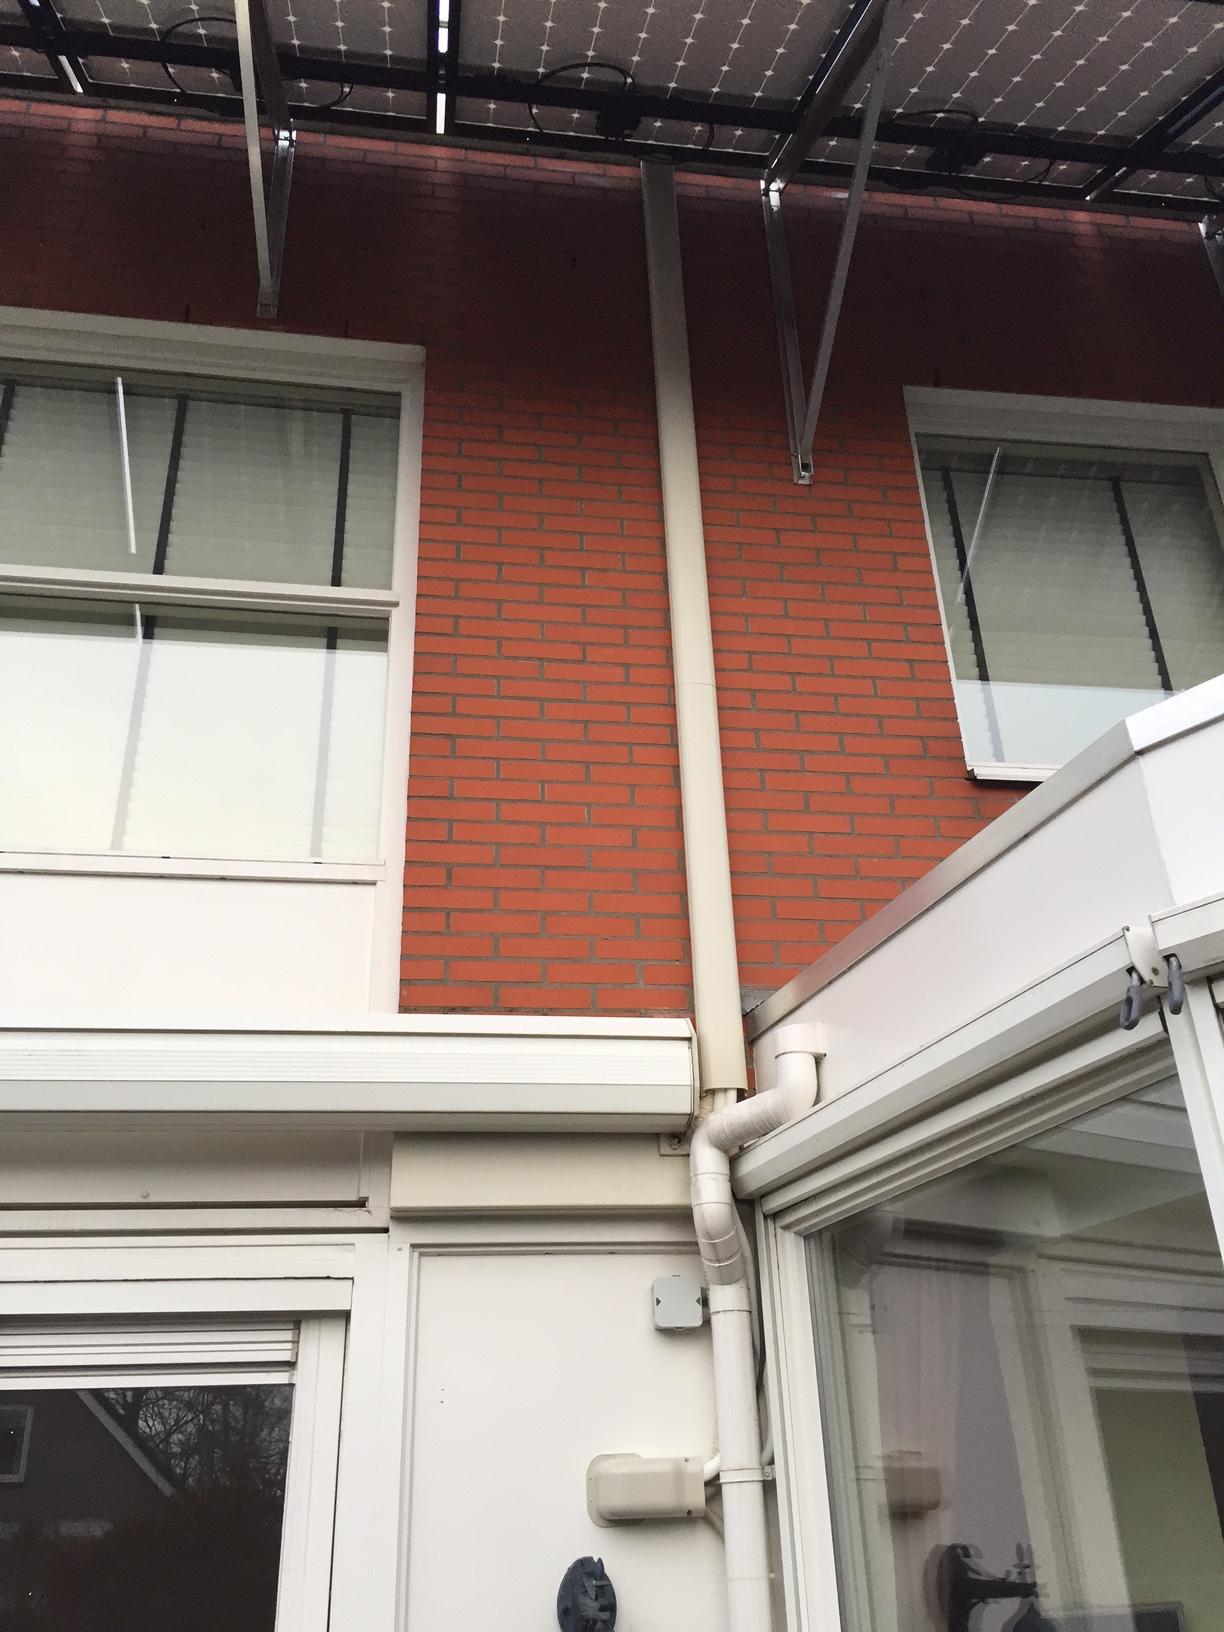 http://www.pijpelink.nl/IMG_3160.JPG